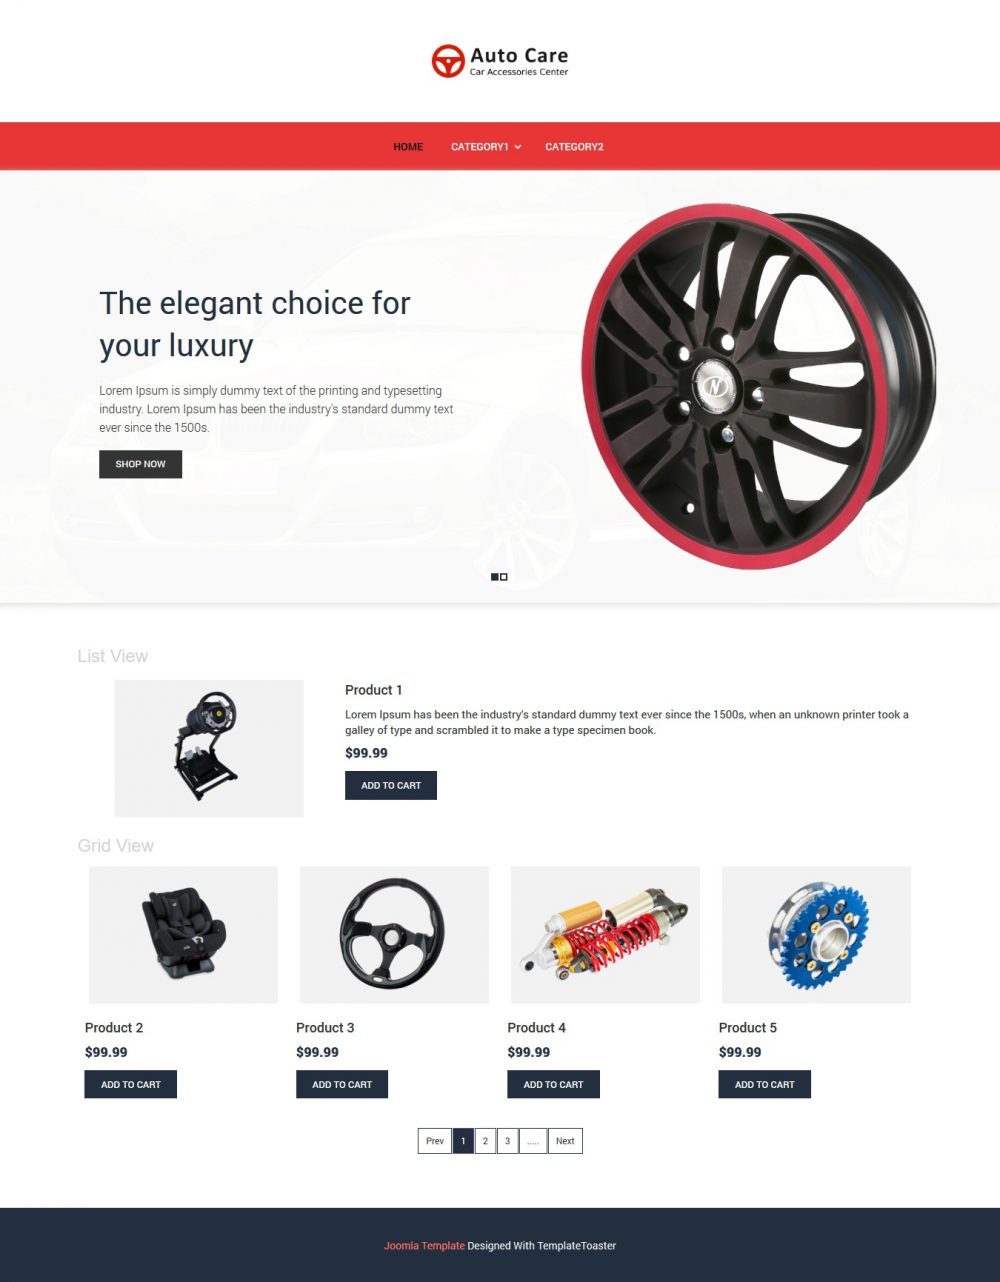 auto care automobile accessories virtuemart template